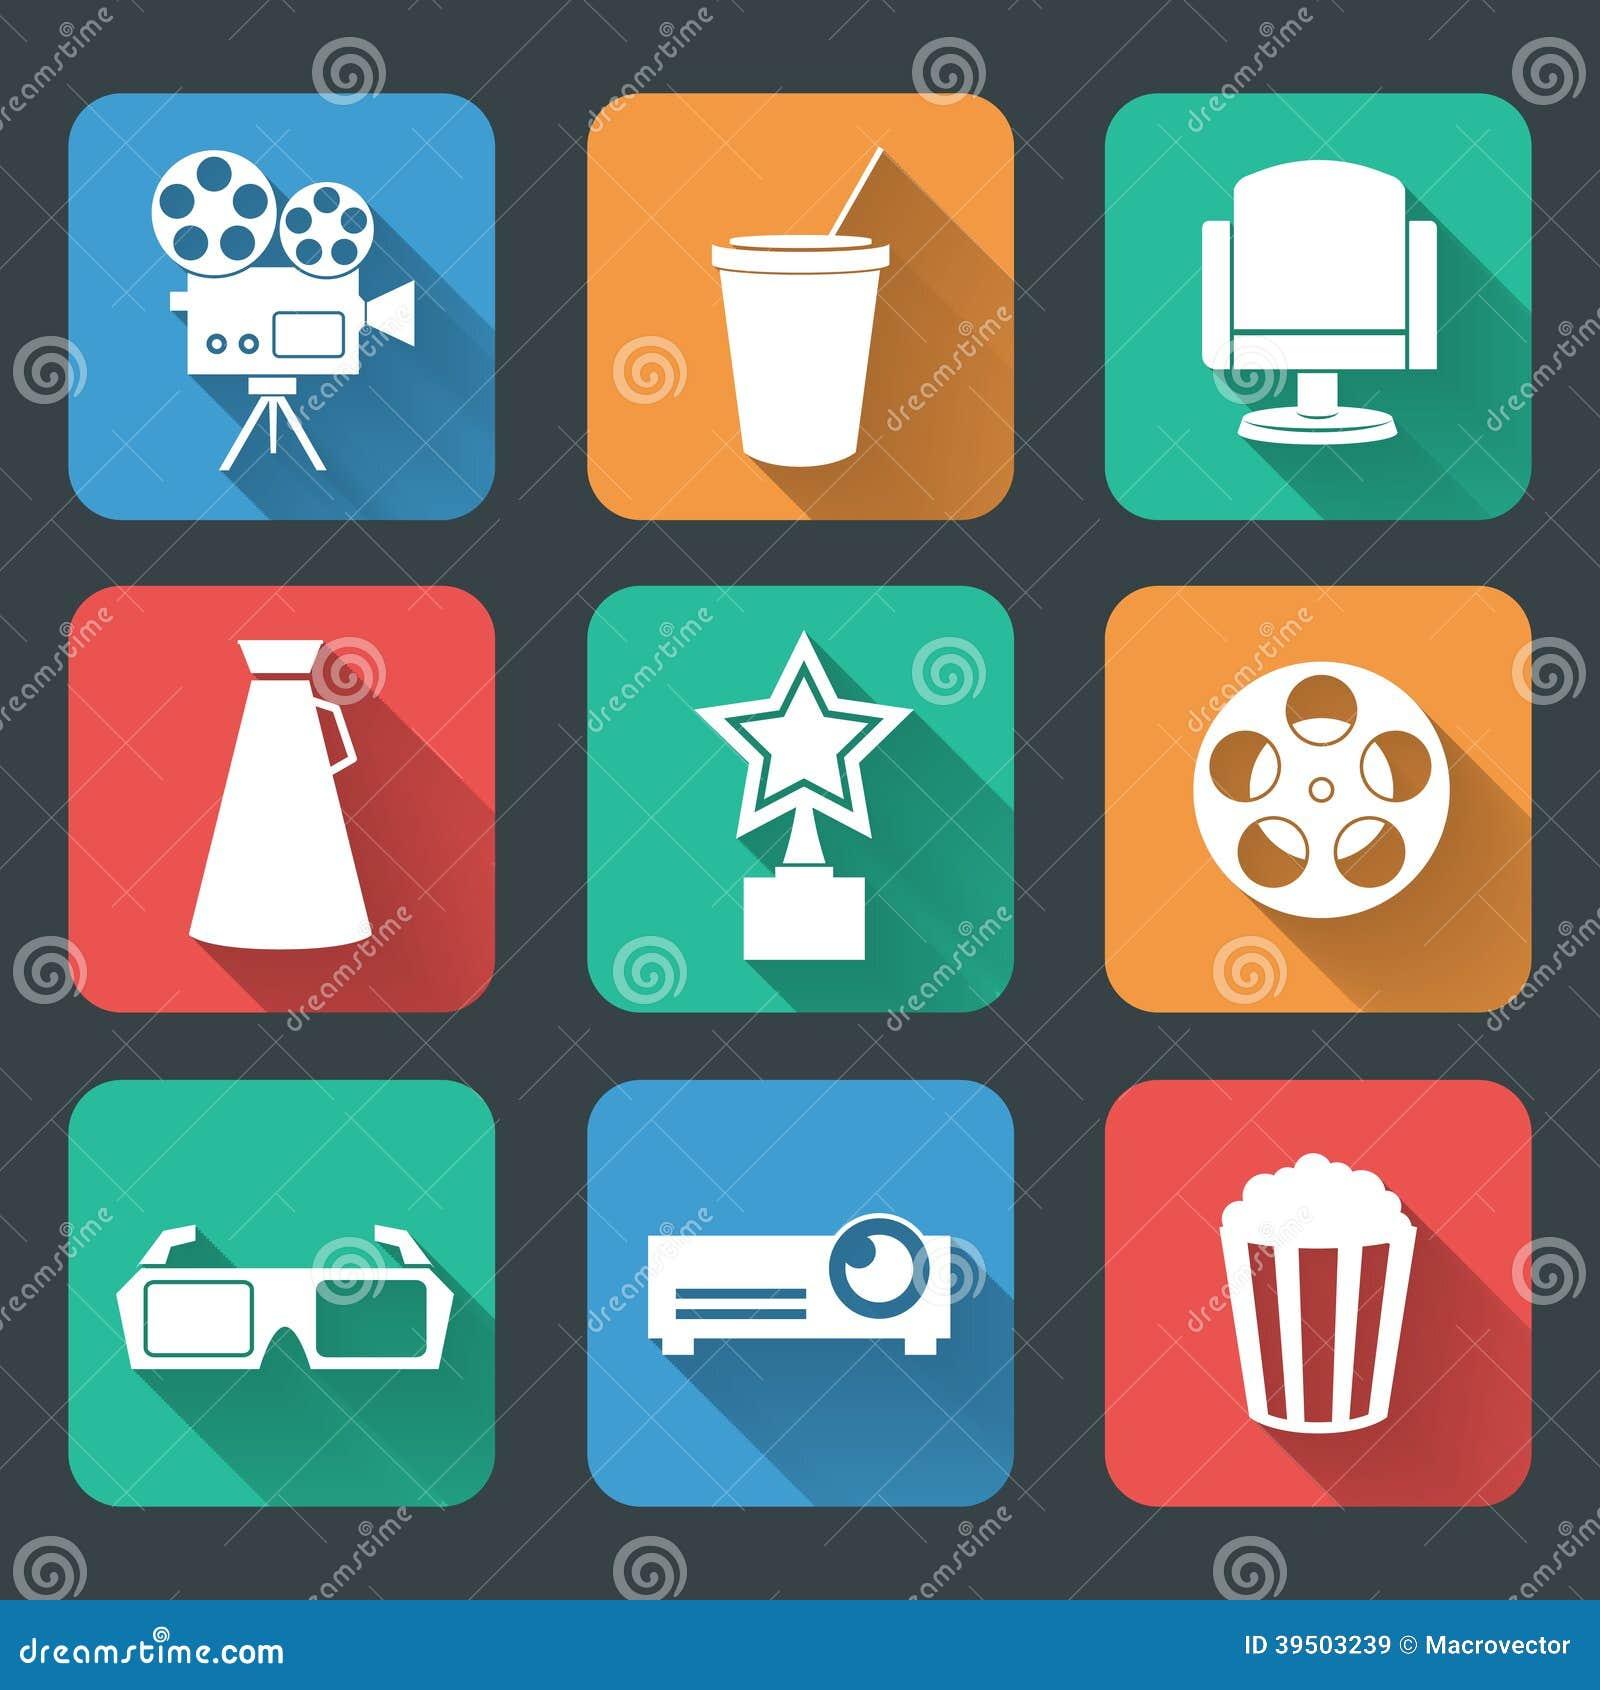 Cinema entertainment pictograms collection